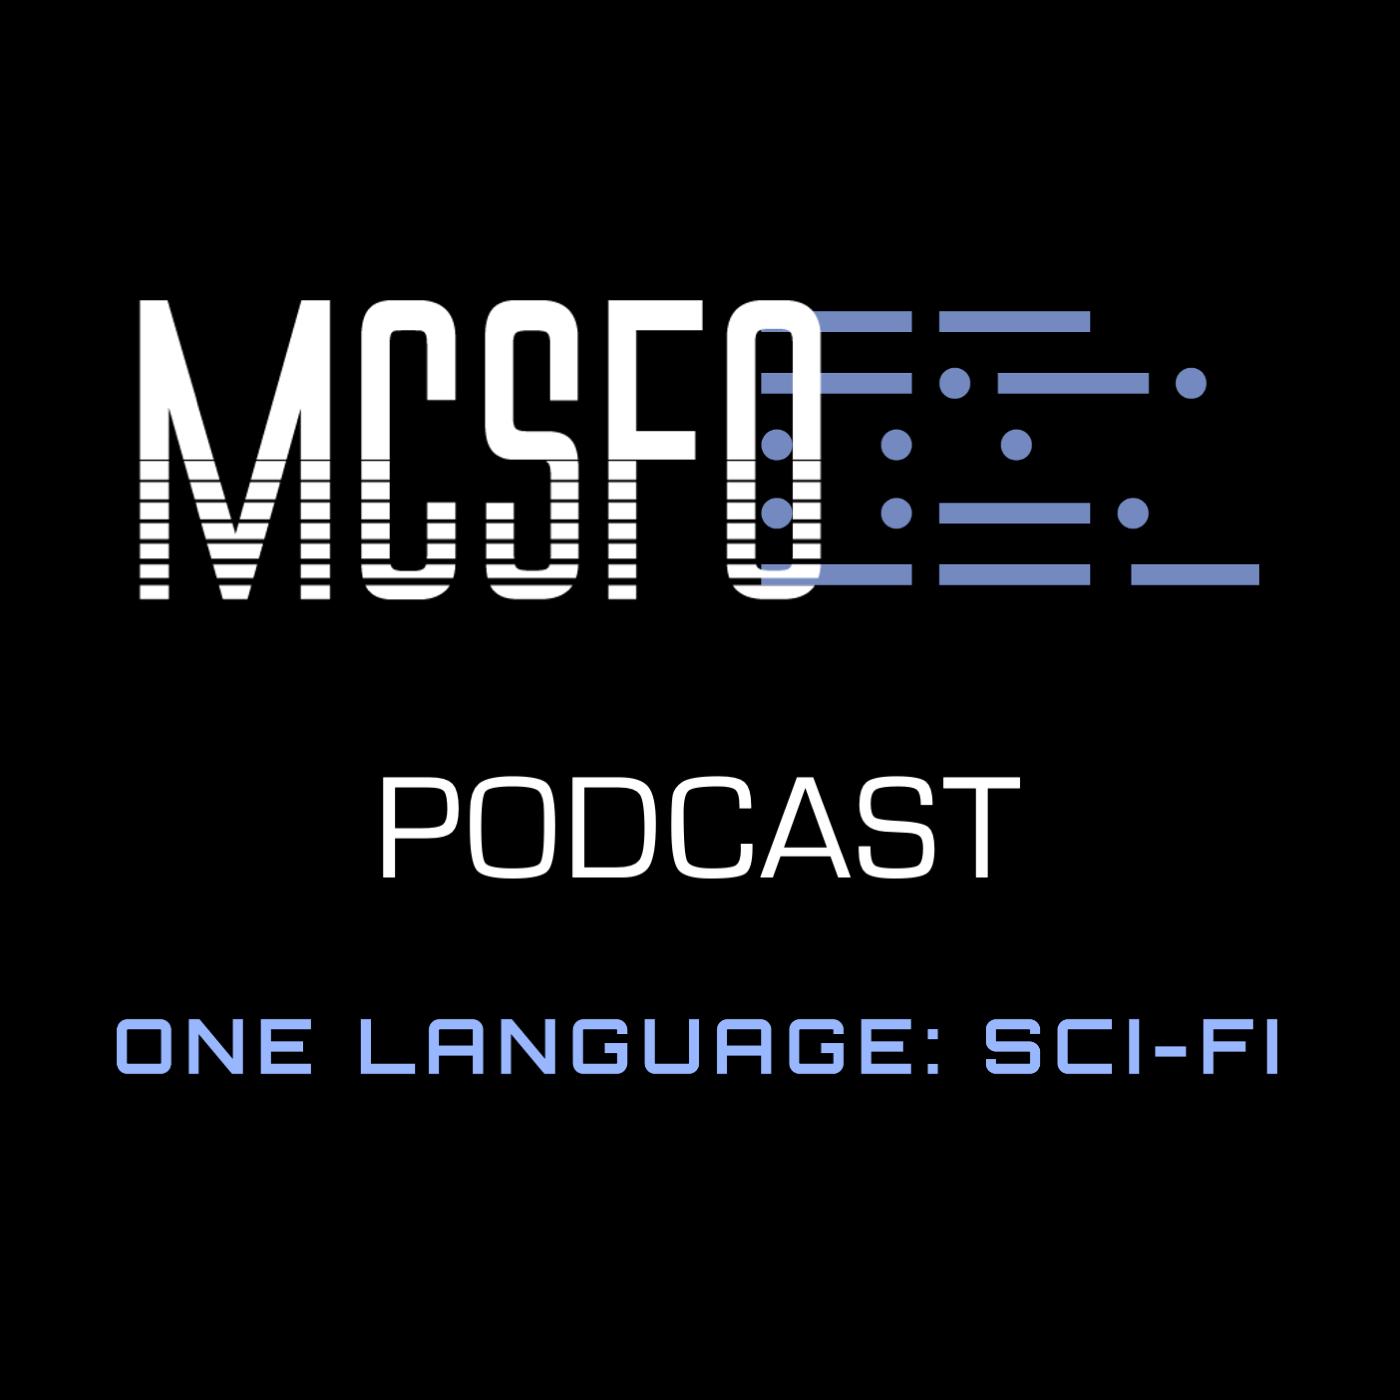 MCSFO Podcast show art